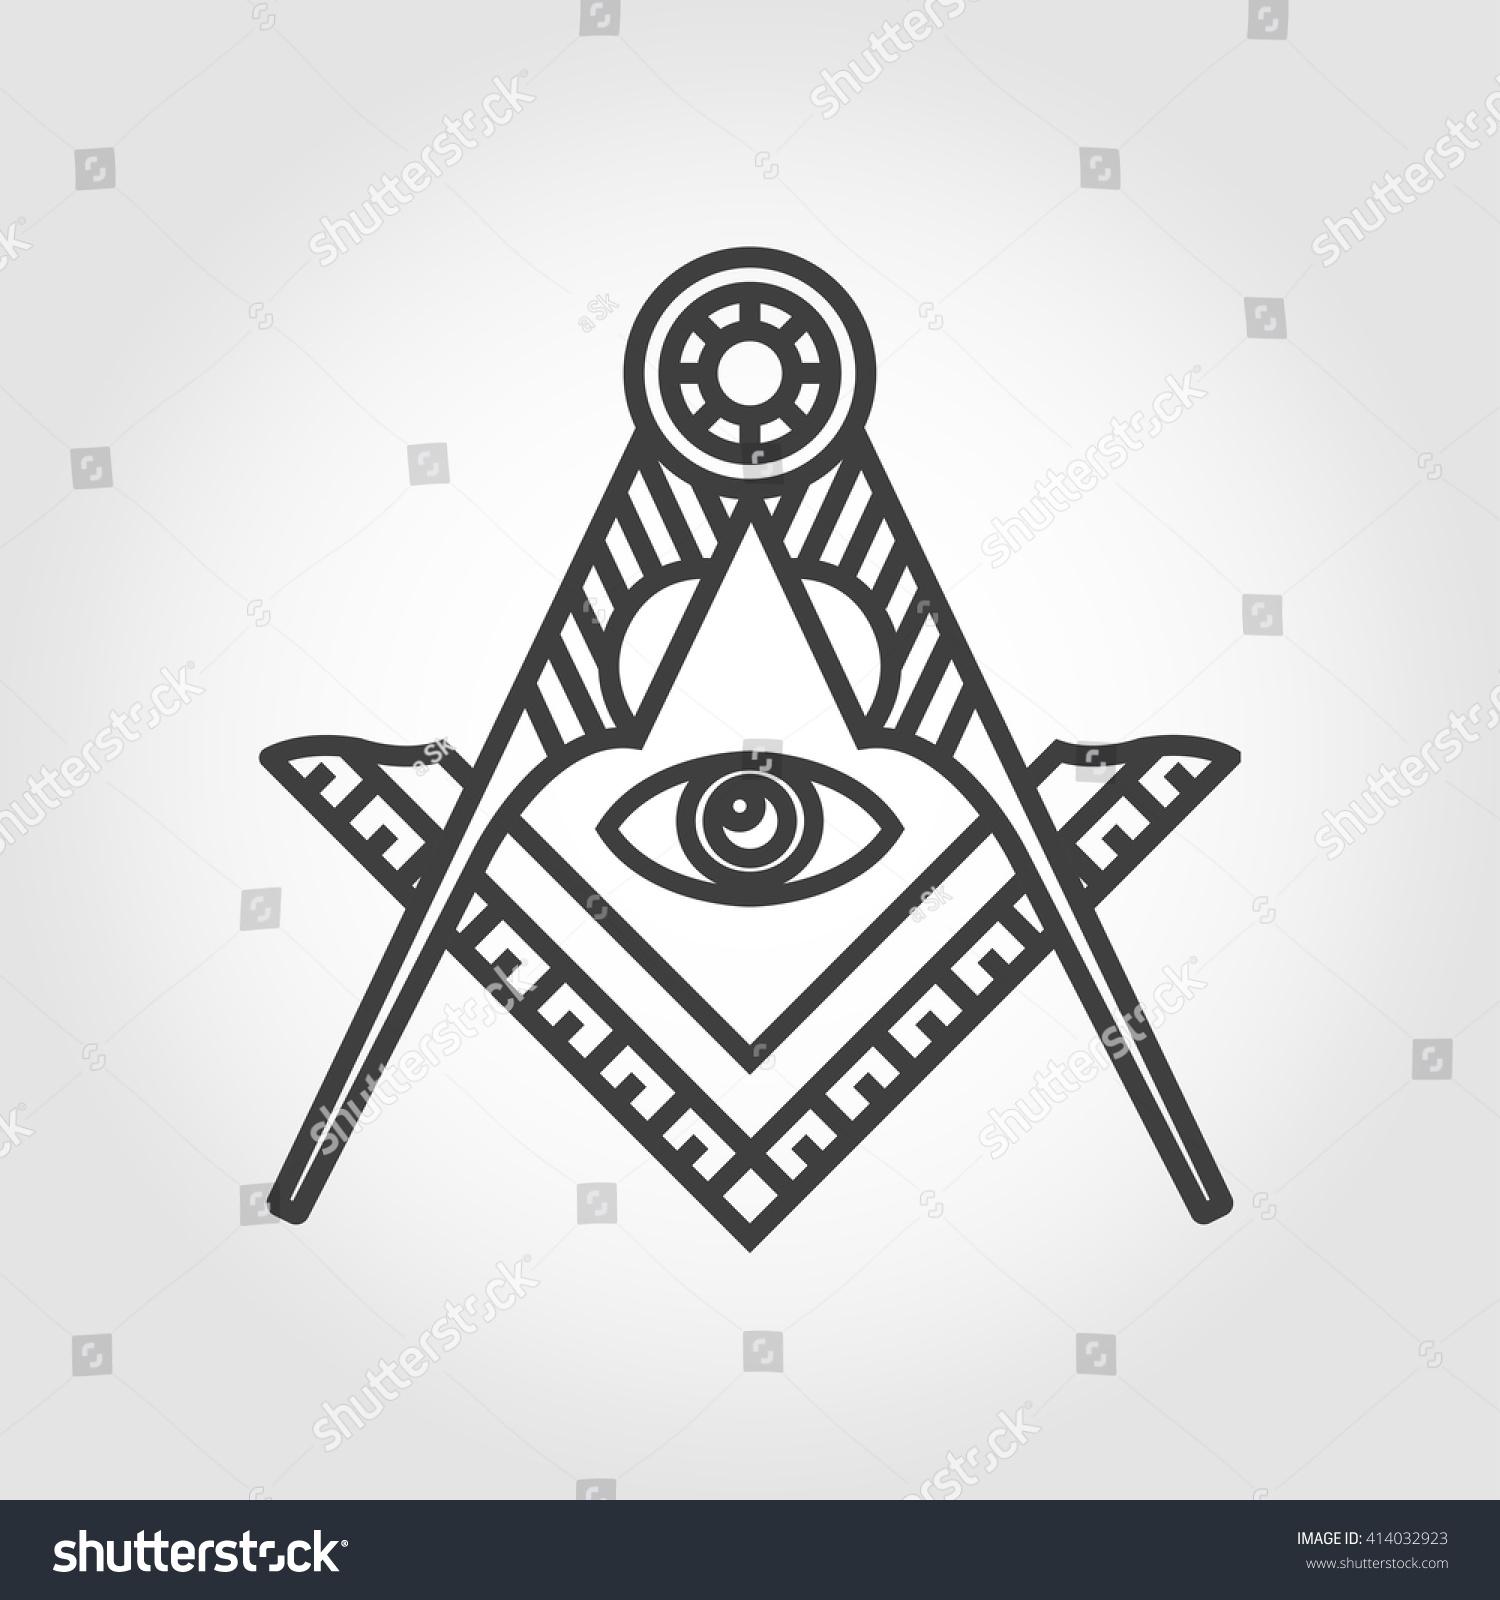 Vector Grey Masonic Freemasonry Emblem Icon Stock Vector Royalty